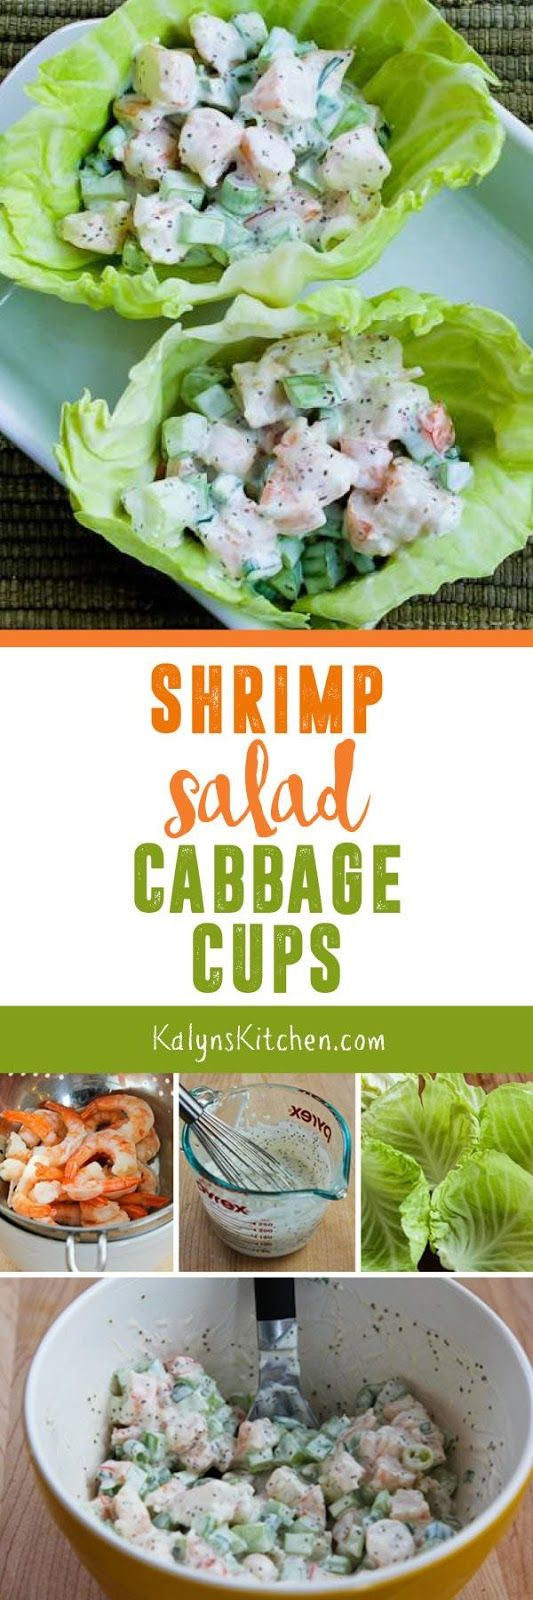 Shrimp Salad Cabbage Cups | Shrimp Salads, Cabbages and Shrimp